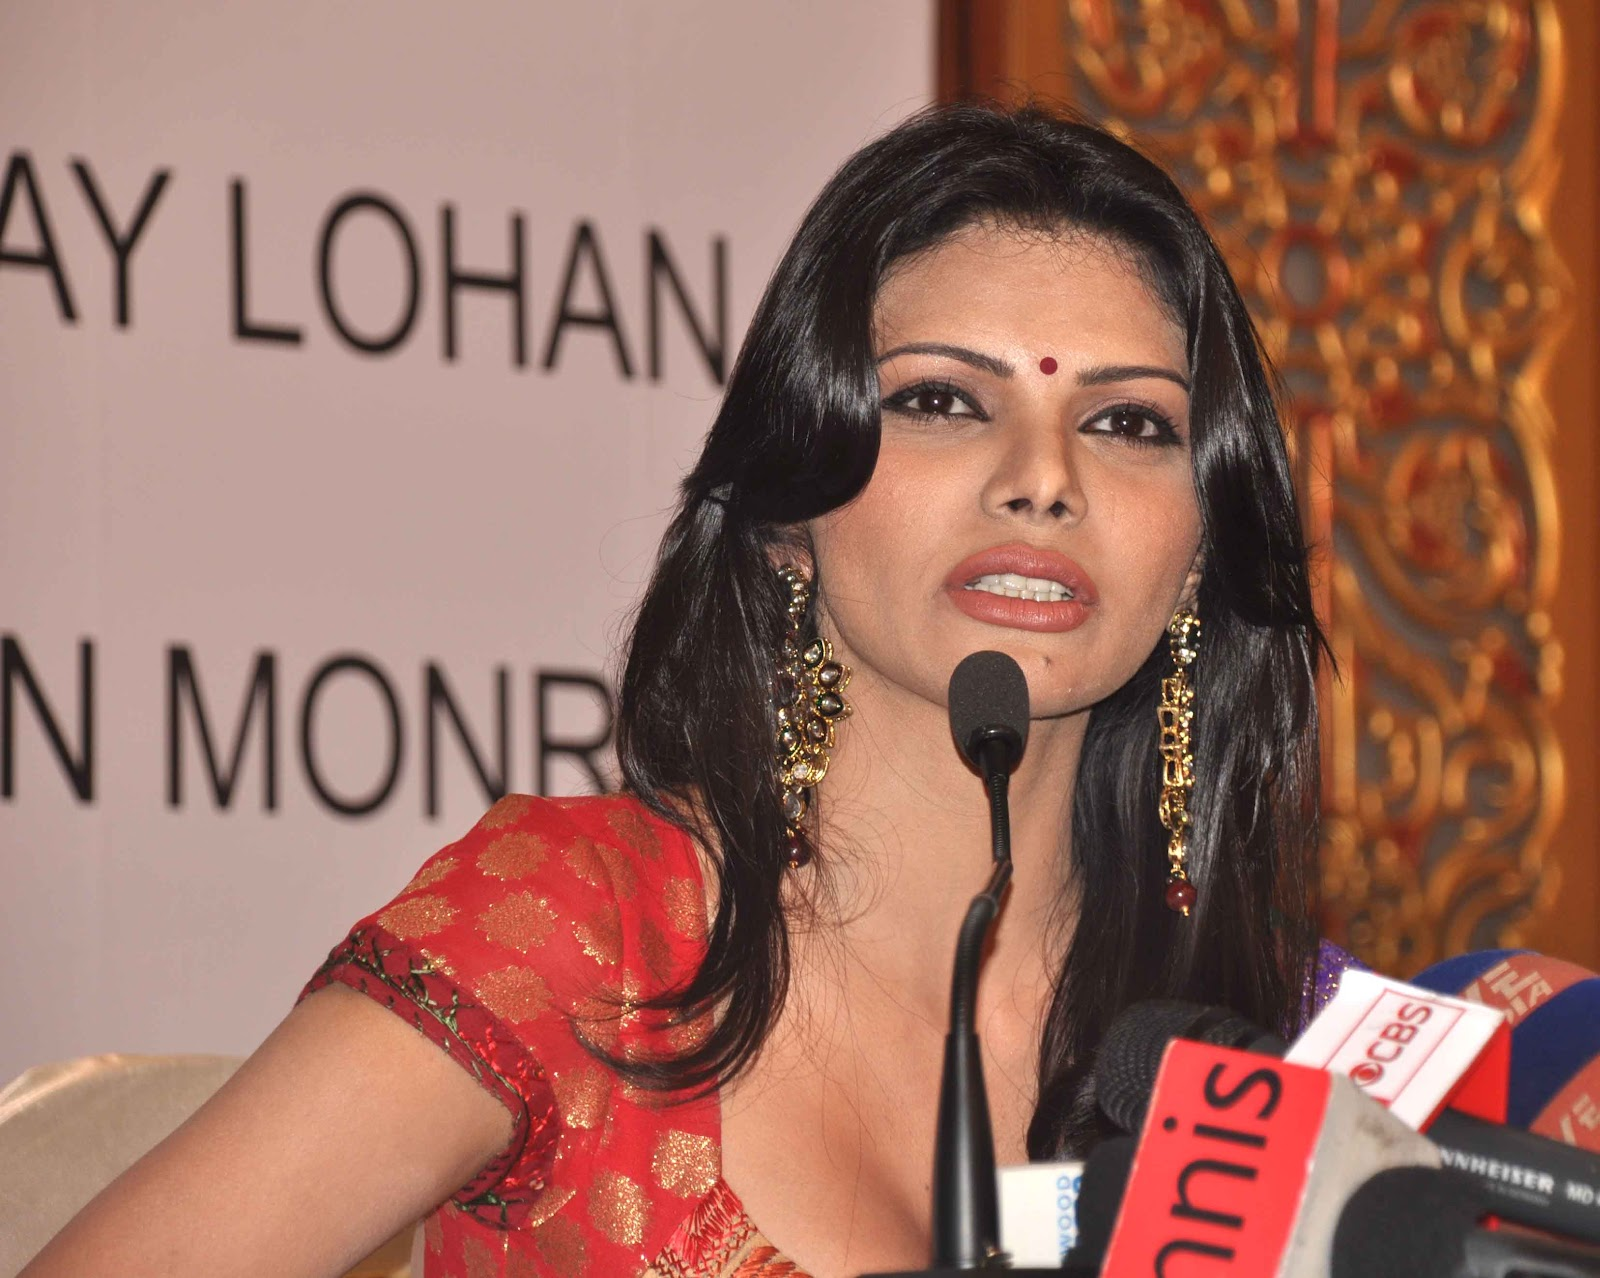 High Quality Bollywood Celebrity Pictures Sherlyn Chopra -1076